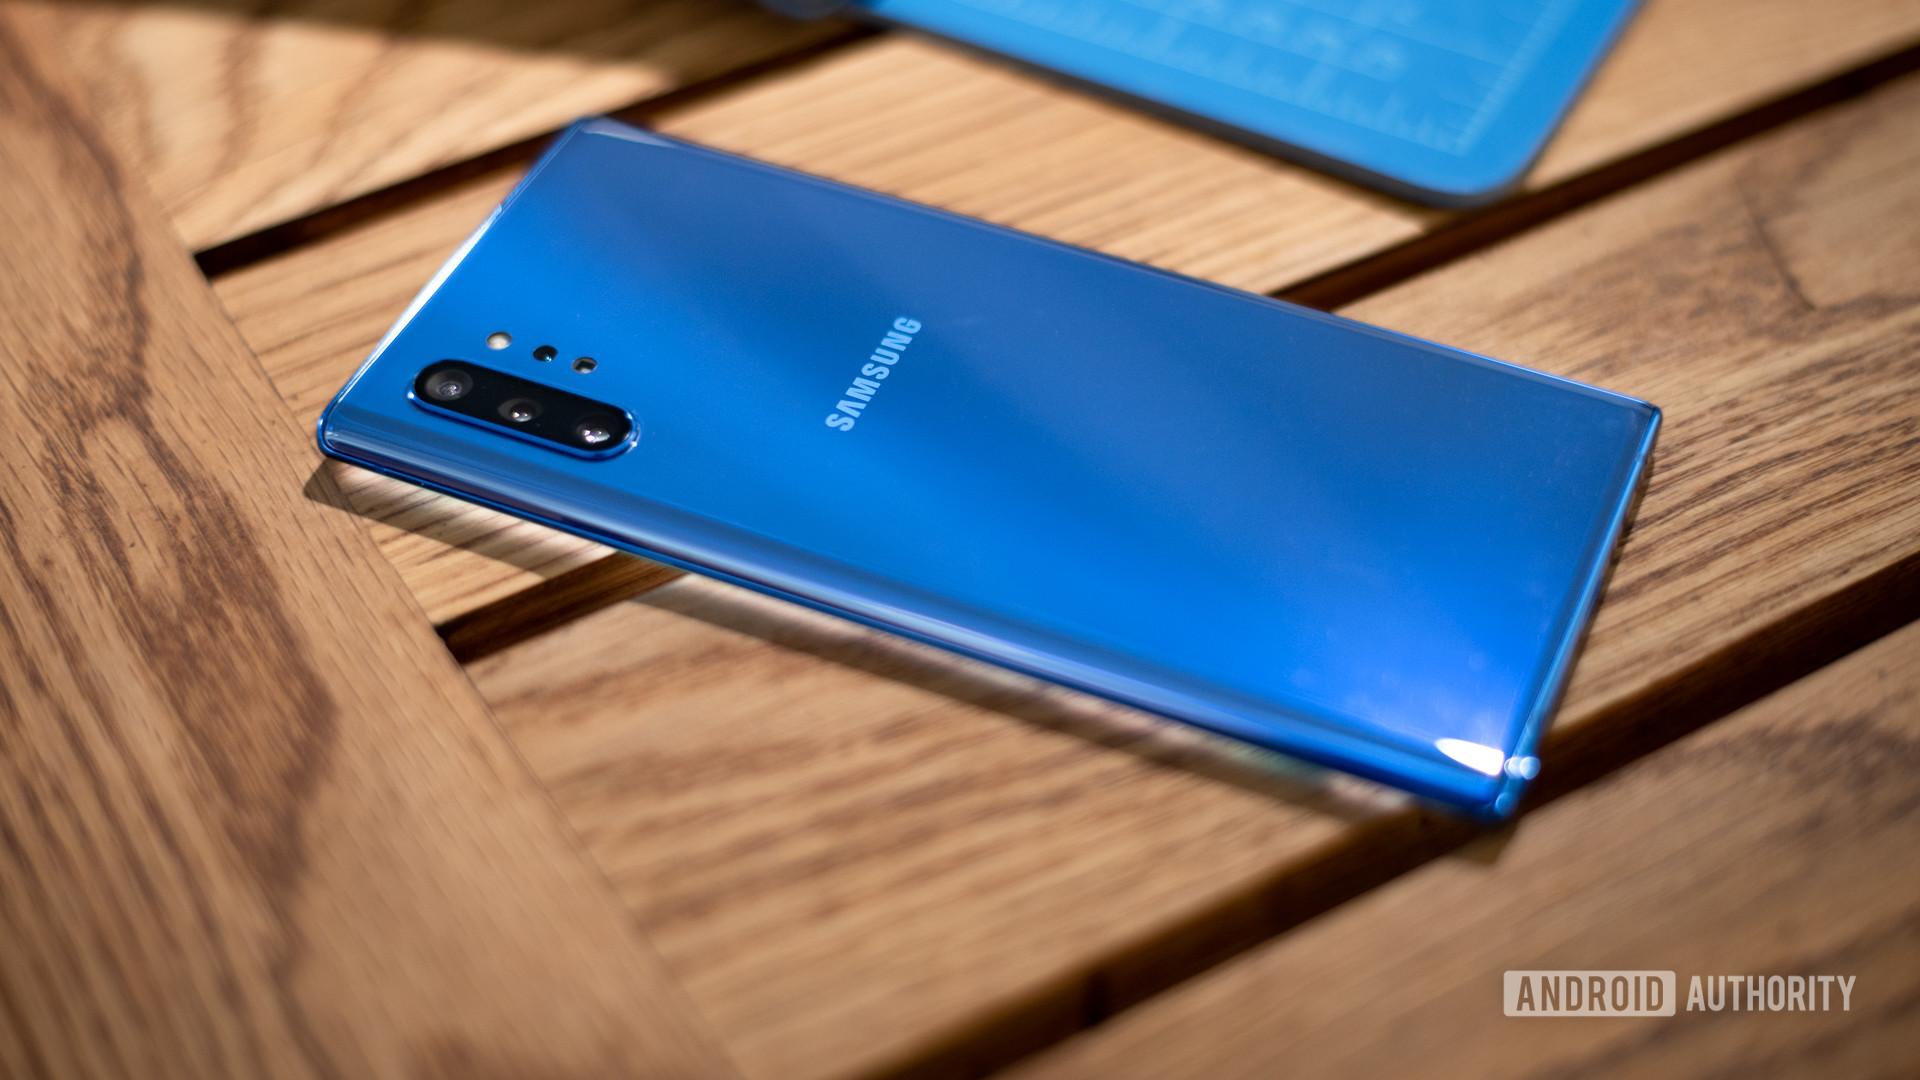 Samsung Galaxy Note 10 Plus Aura Blue at angle